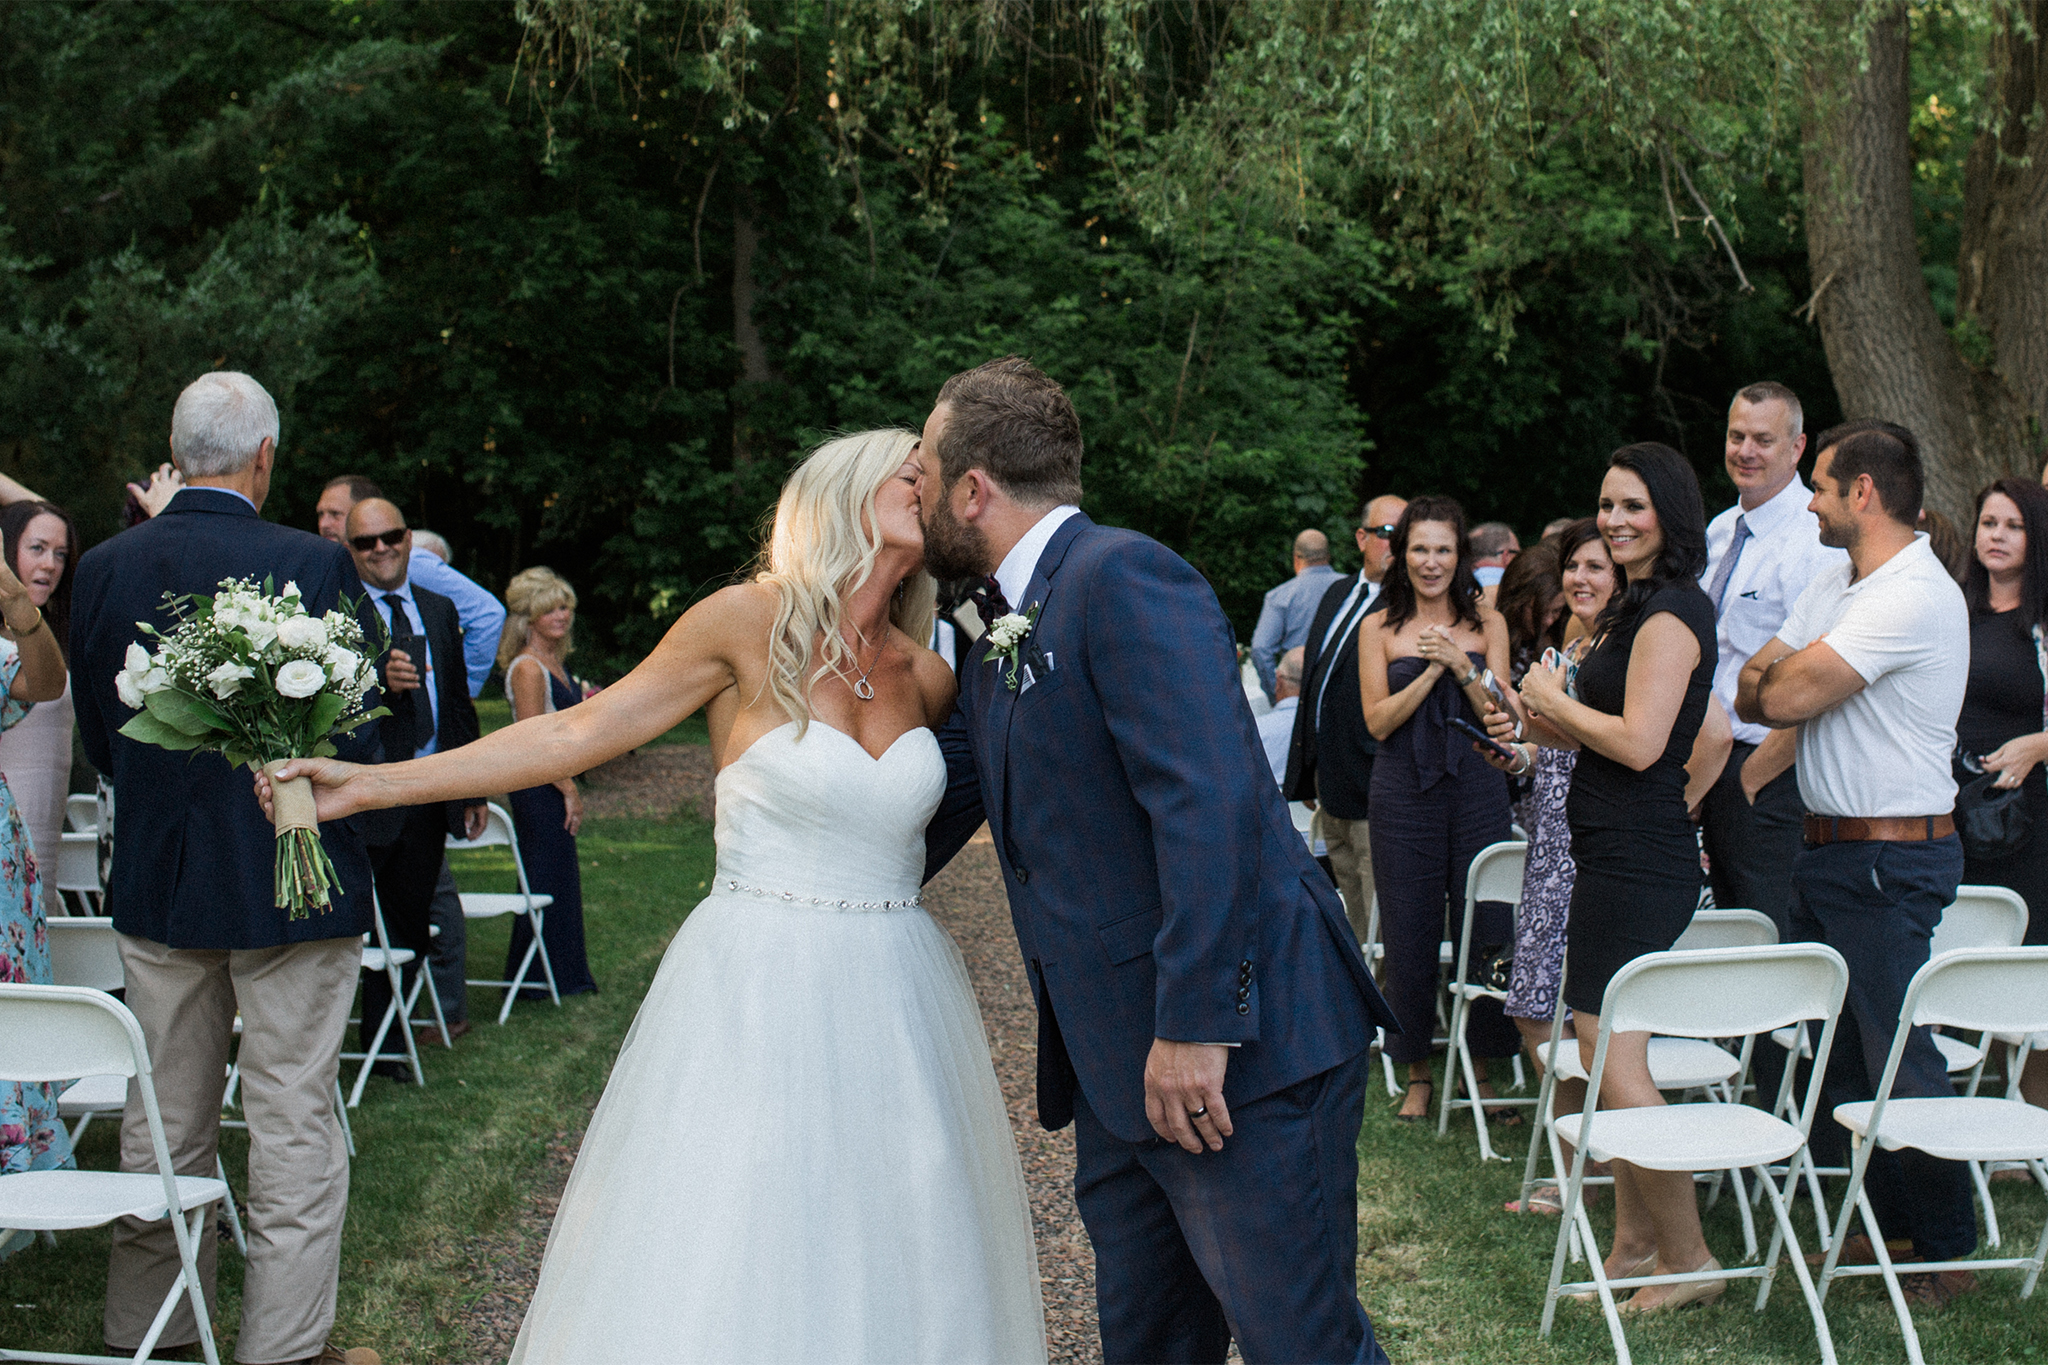 Harvest Restaurant Wedding Brooklin Ontario - Bride and groom kiss